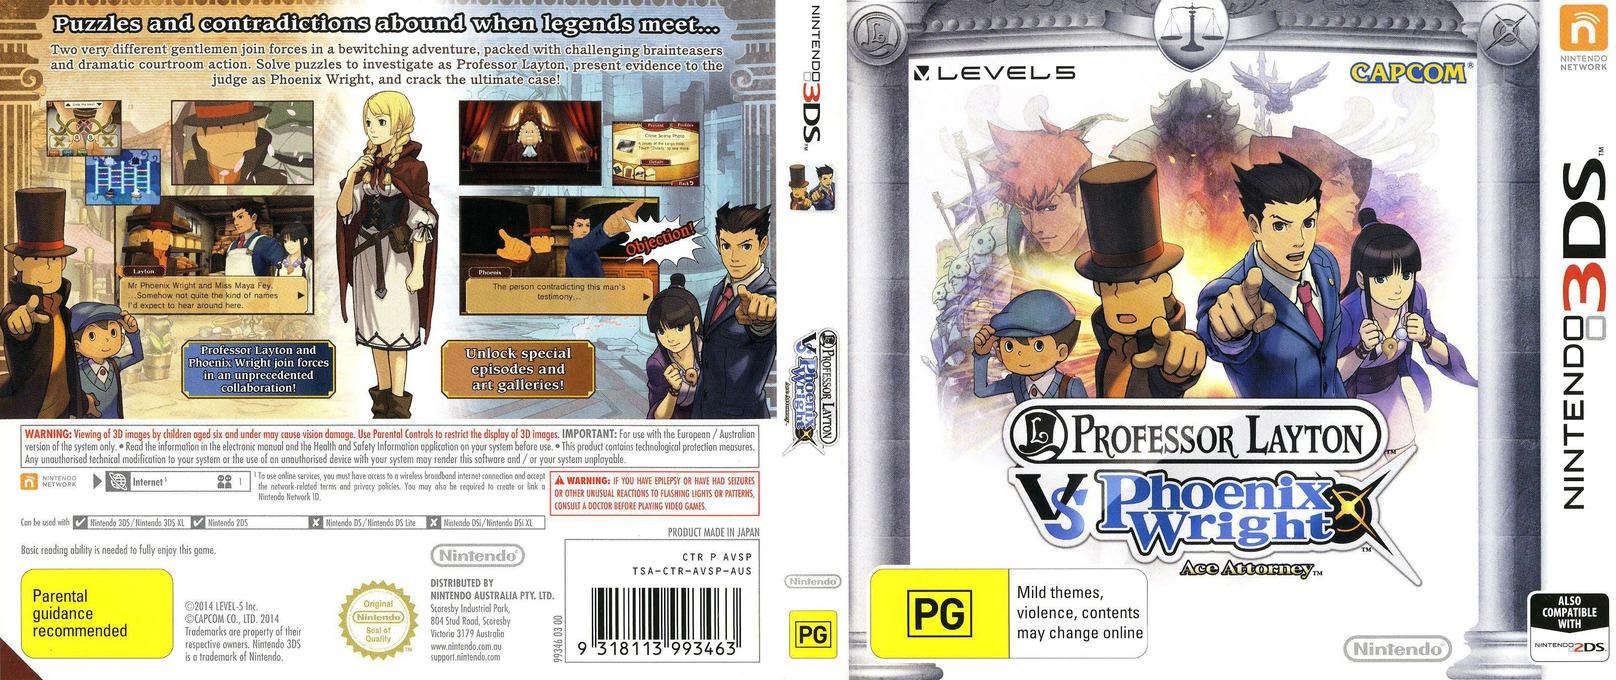 Professor Layton vs. Phoenix Wright - Ace Attorney 3DS coverfullHQ (AVSP)